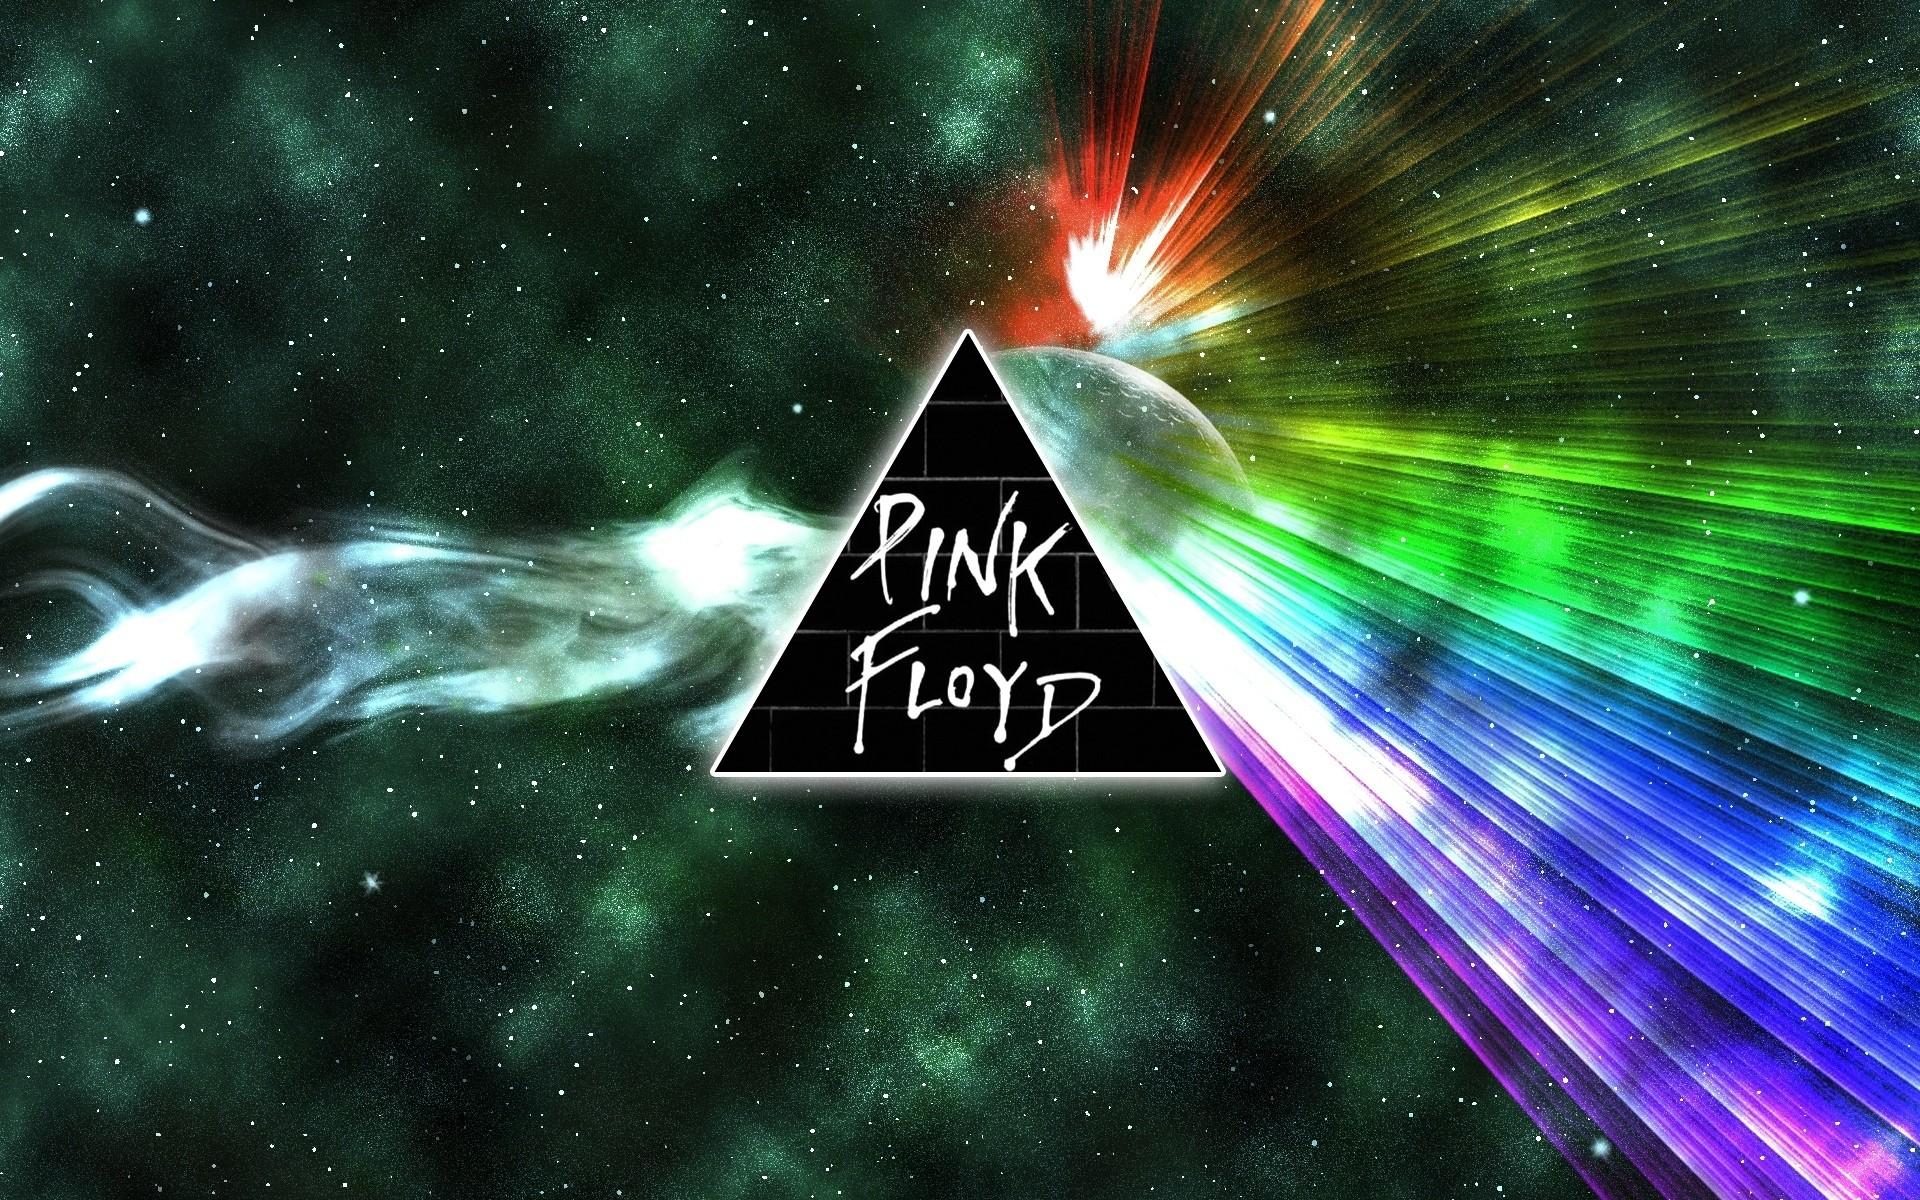 Pink Floyd Wallpaper ·① WallpaperTag